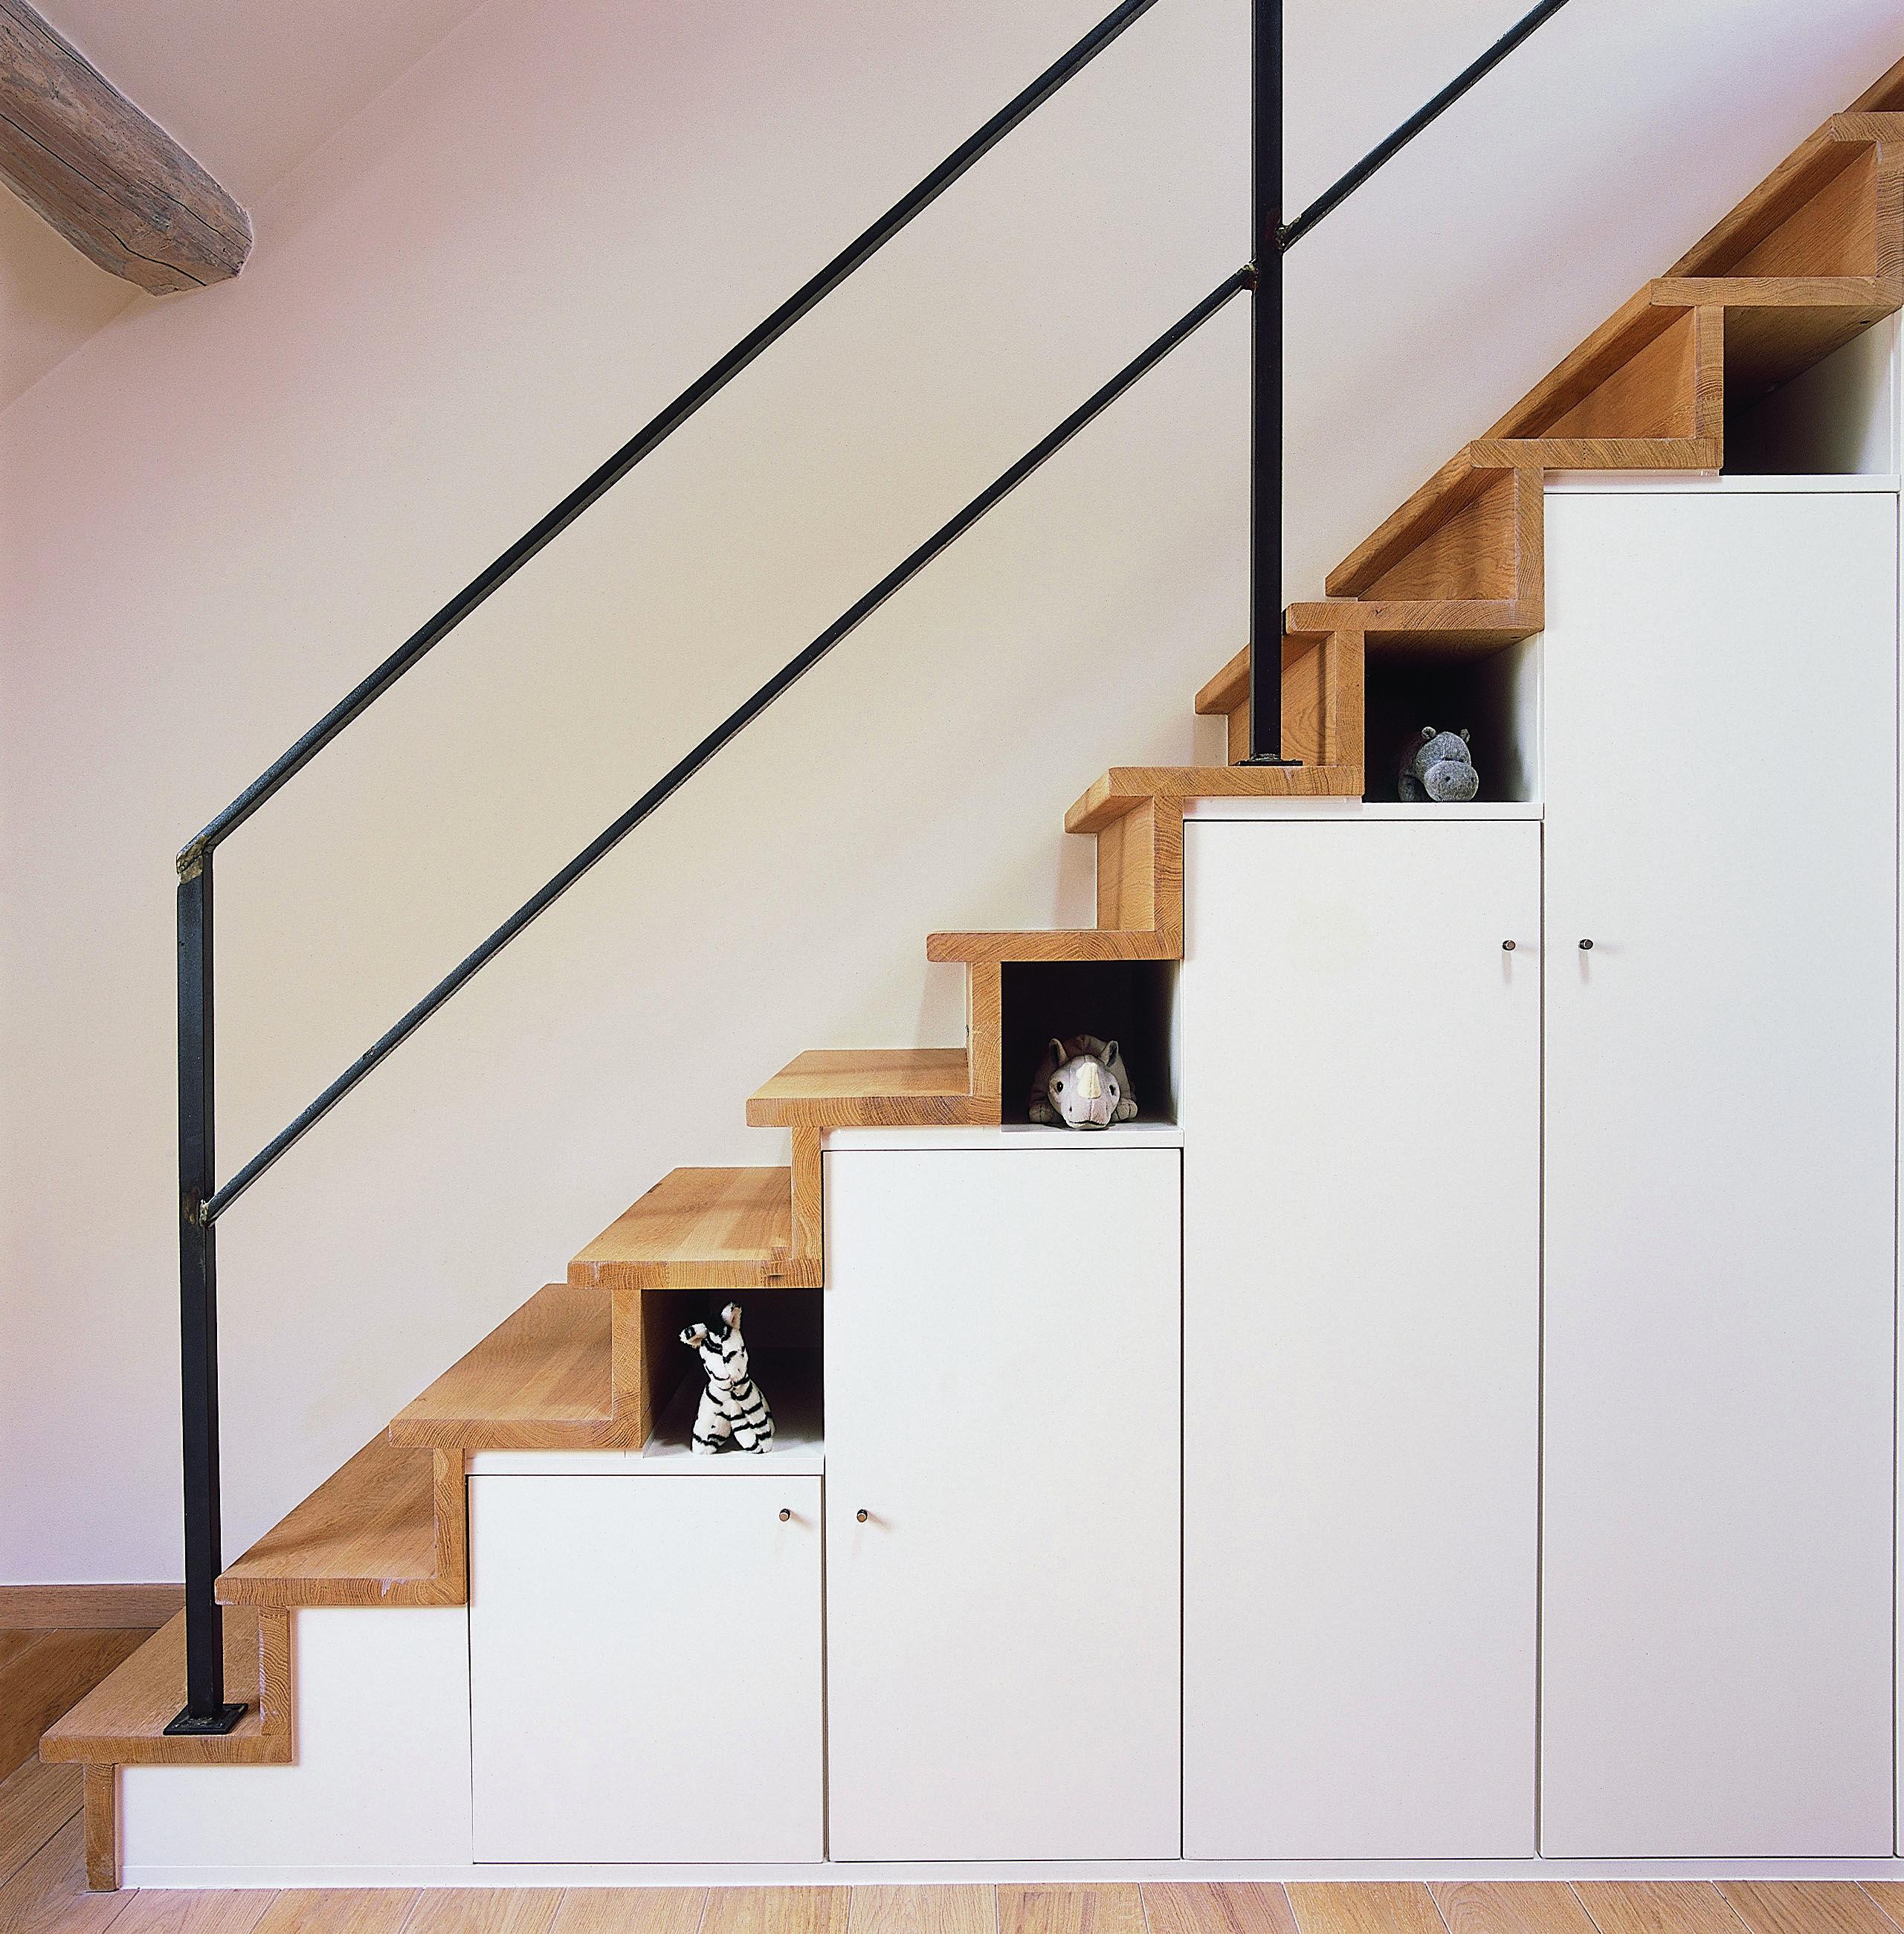 4 Under Stair Storage System In 2020 Stairs Design Staircase